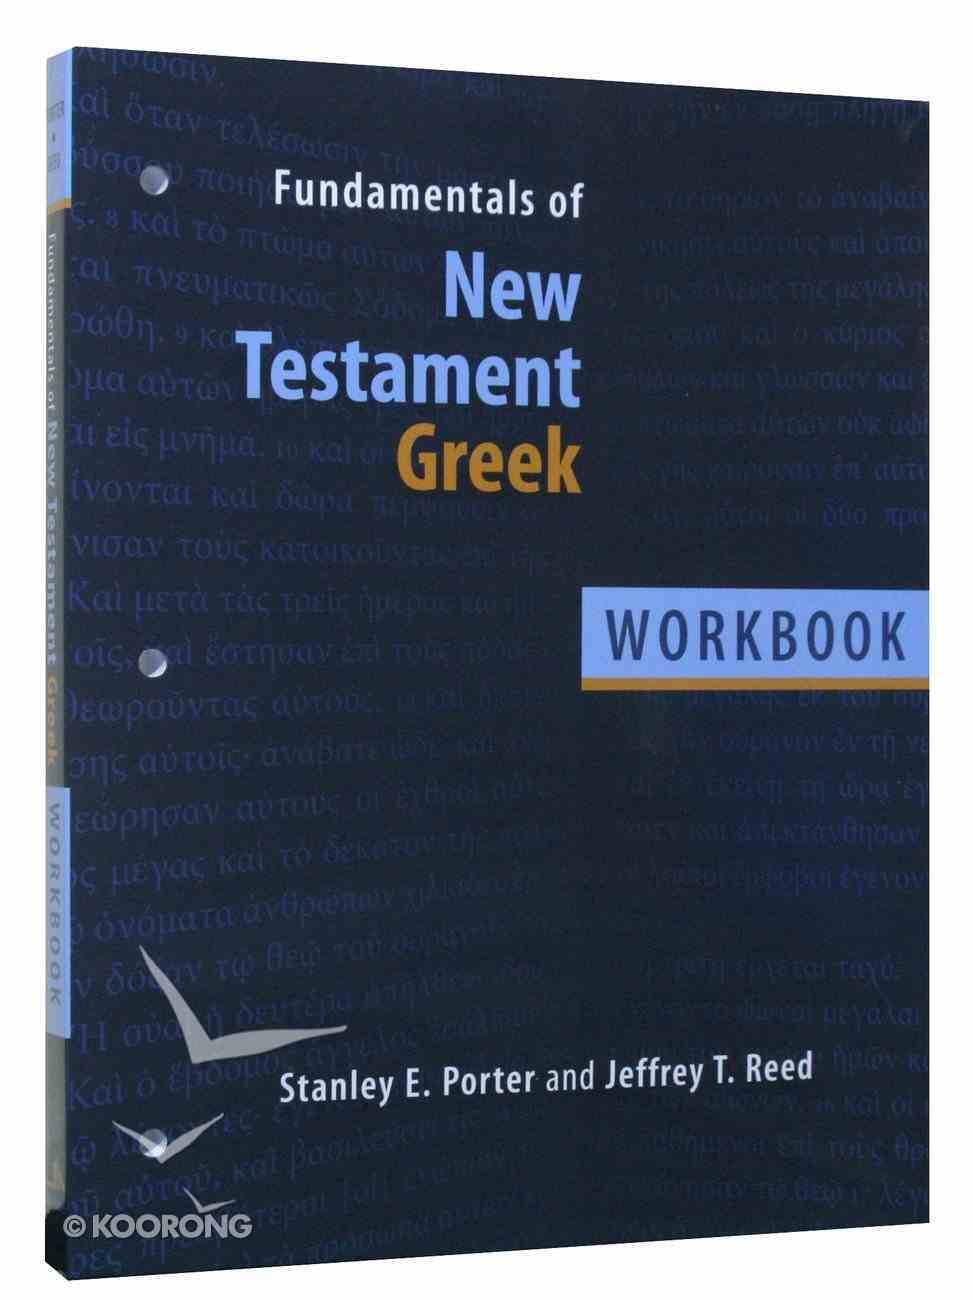 Fundamentals of New Testament Greek (Workbook) Paperback